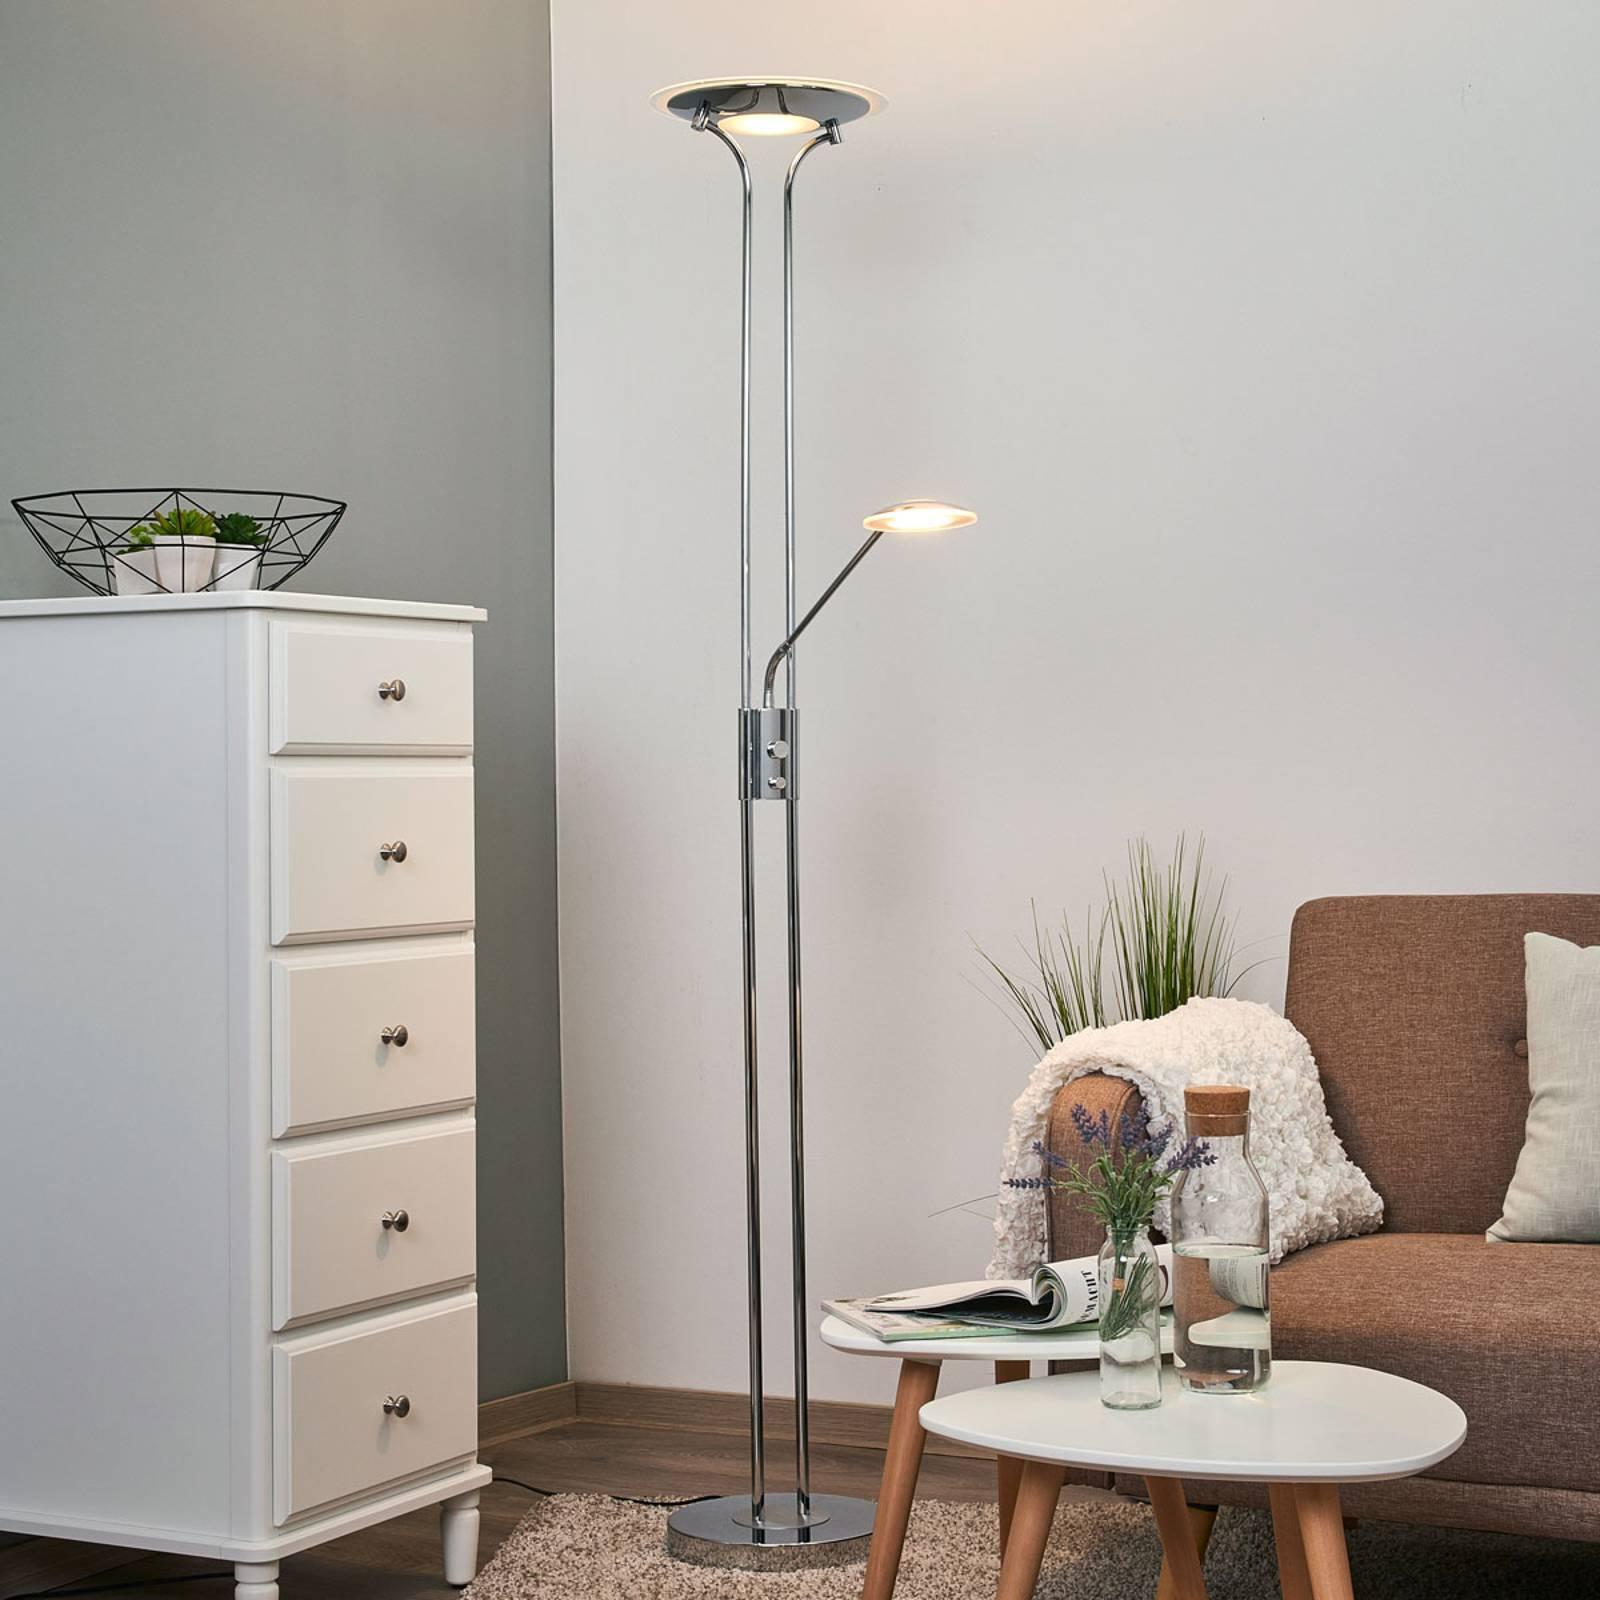 Aras – LED-lattiavalaisin lukulampulla, kromi